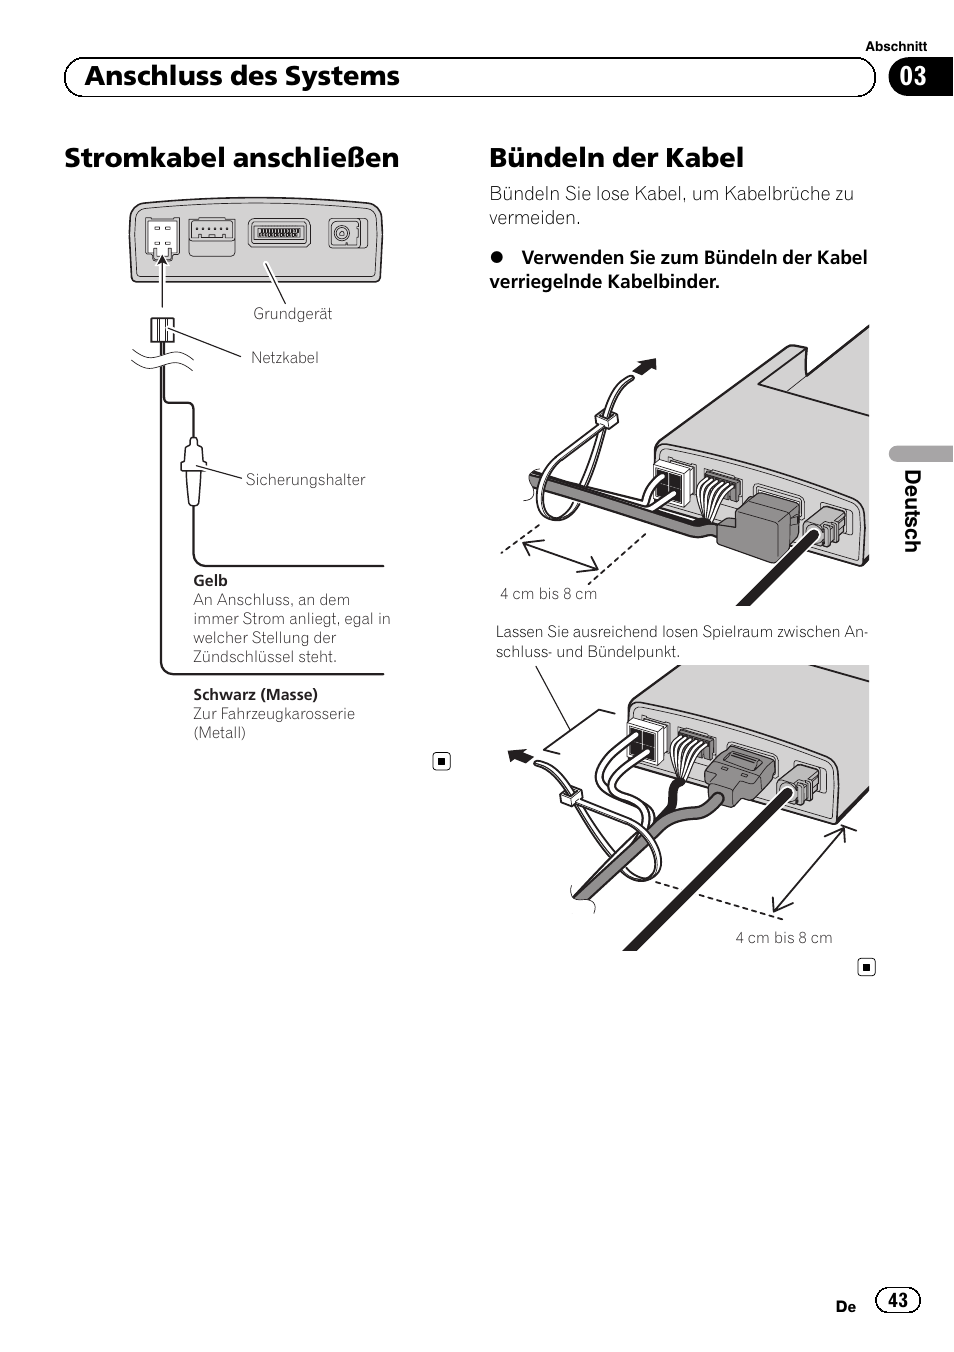 Stromkabel anschließen, Bündeln der kabel, 03 anschluss des systems ...